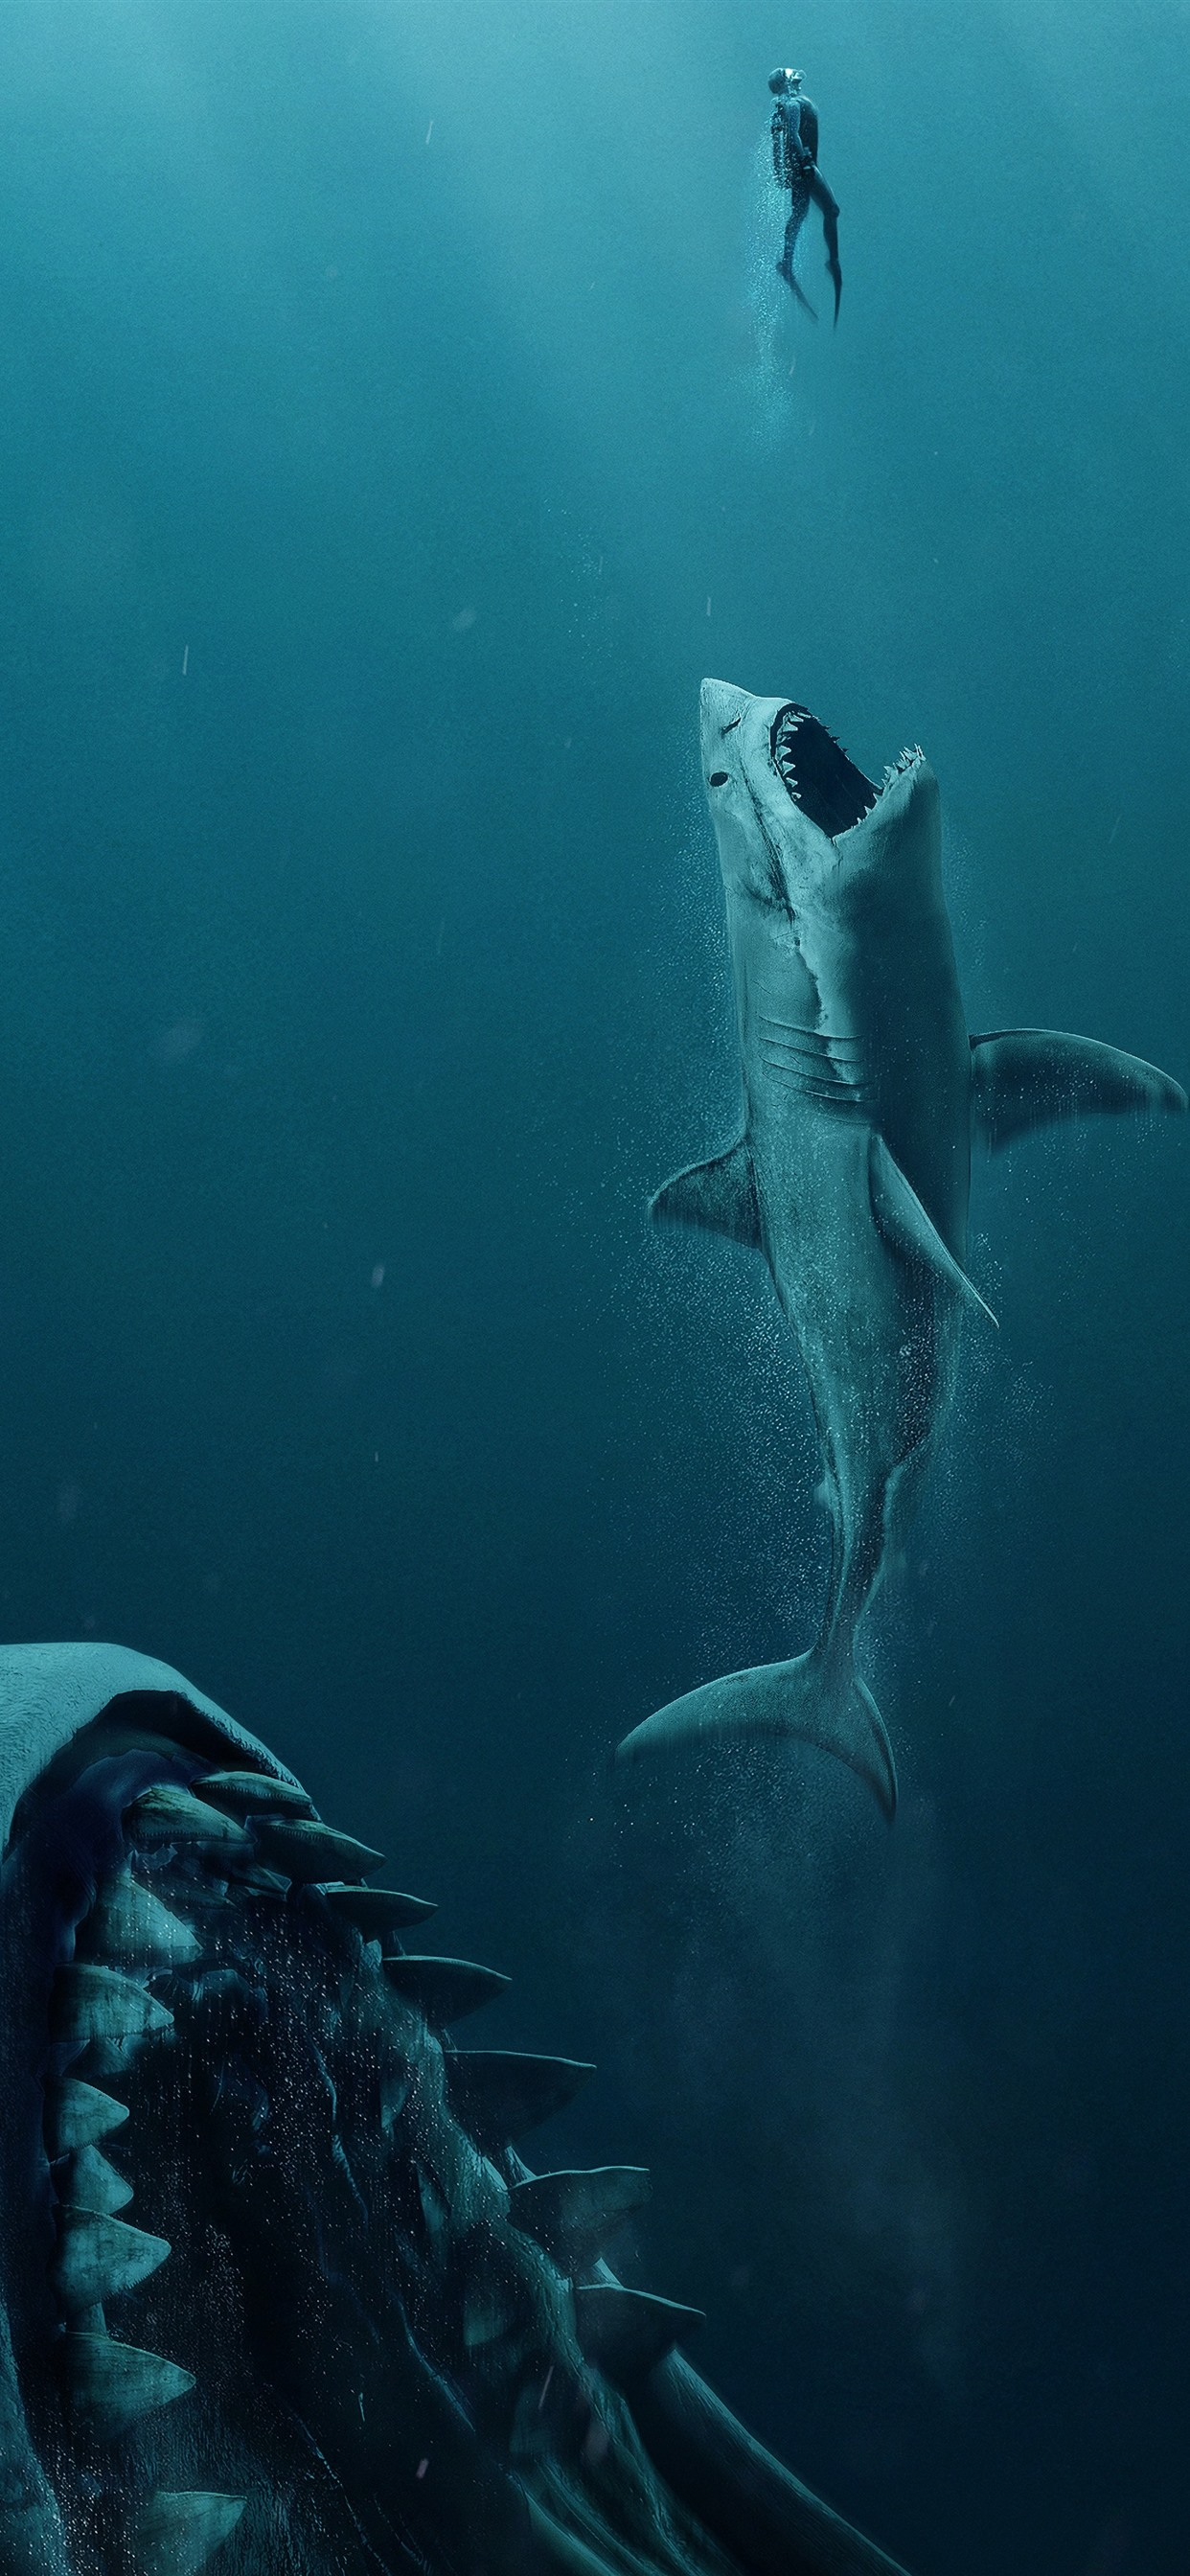 The Meg Shark Underwater 1242x2688 Iphone Xs Max Wallpaper